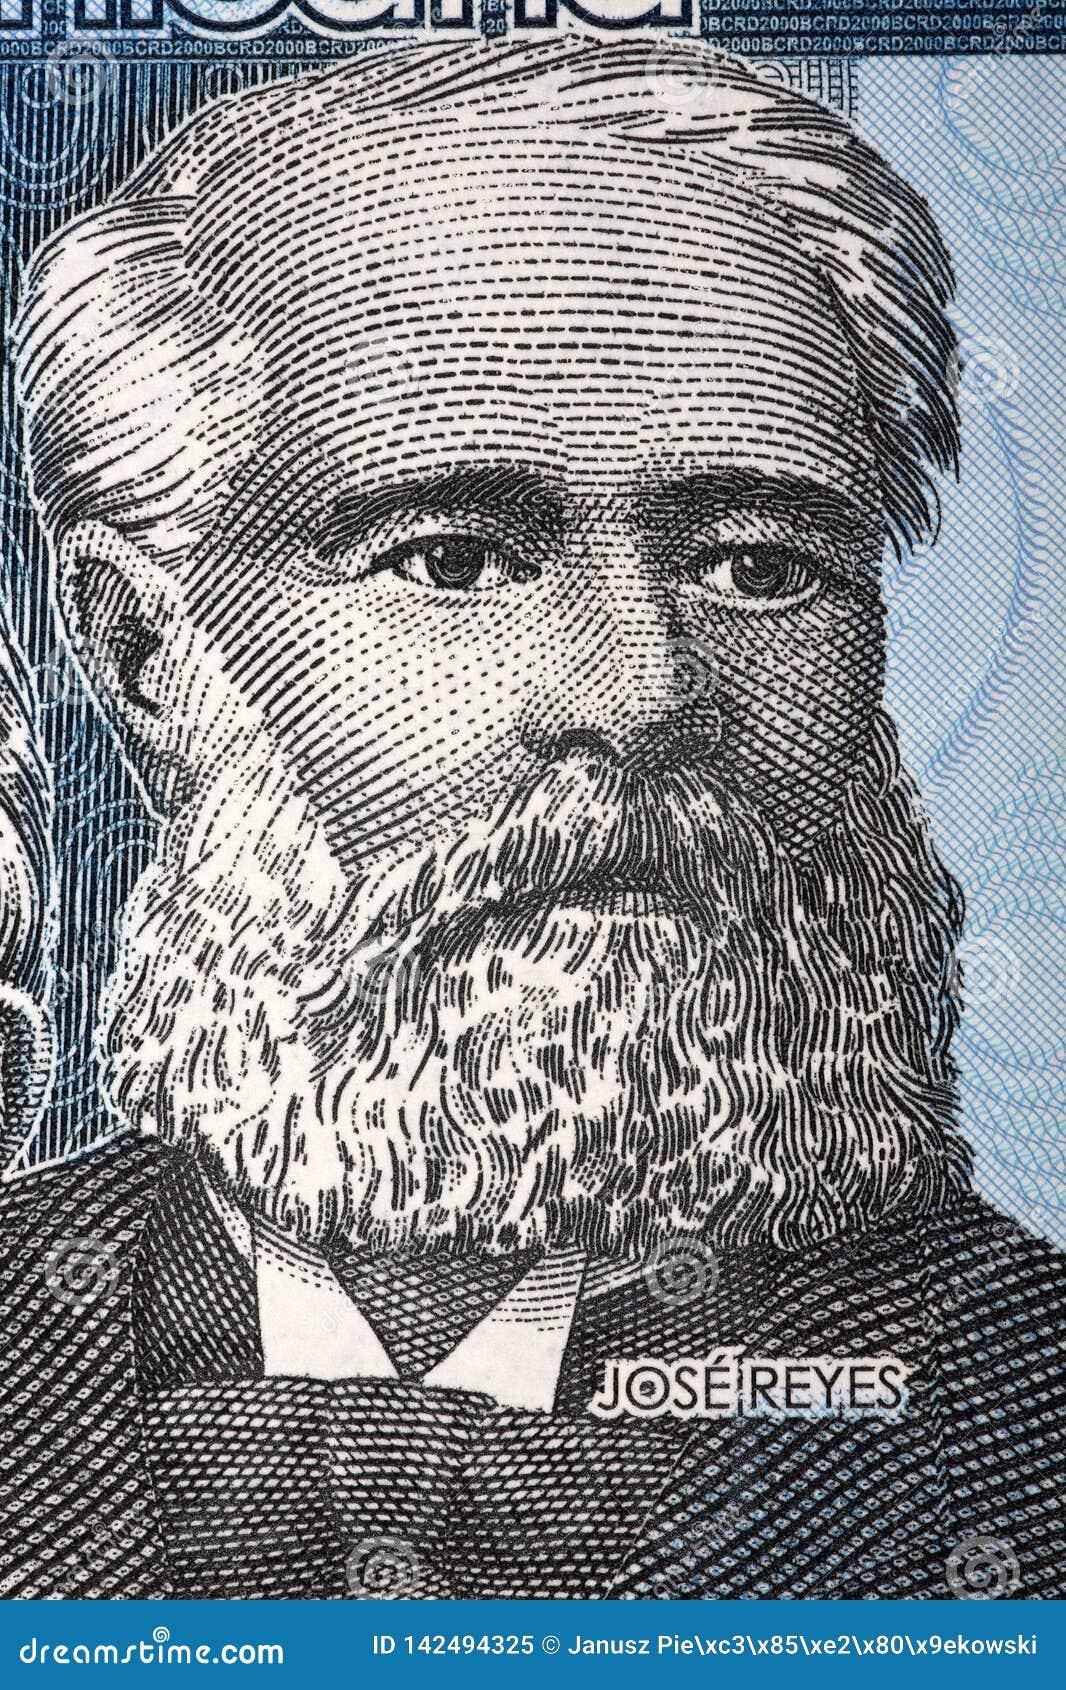 Jose Rufino Reyes un portrait